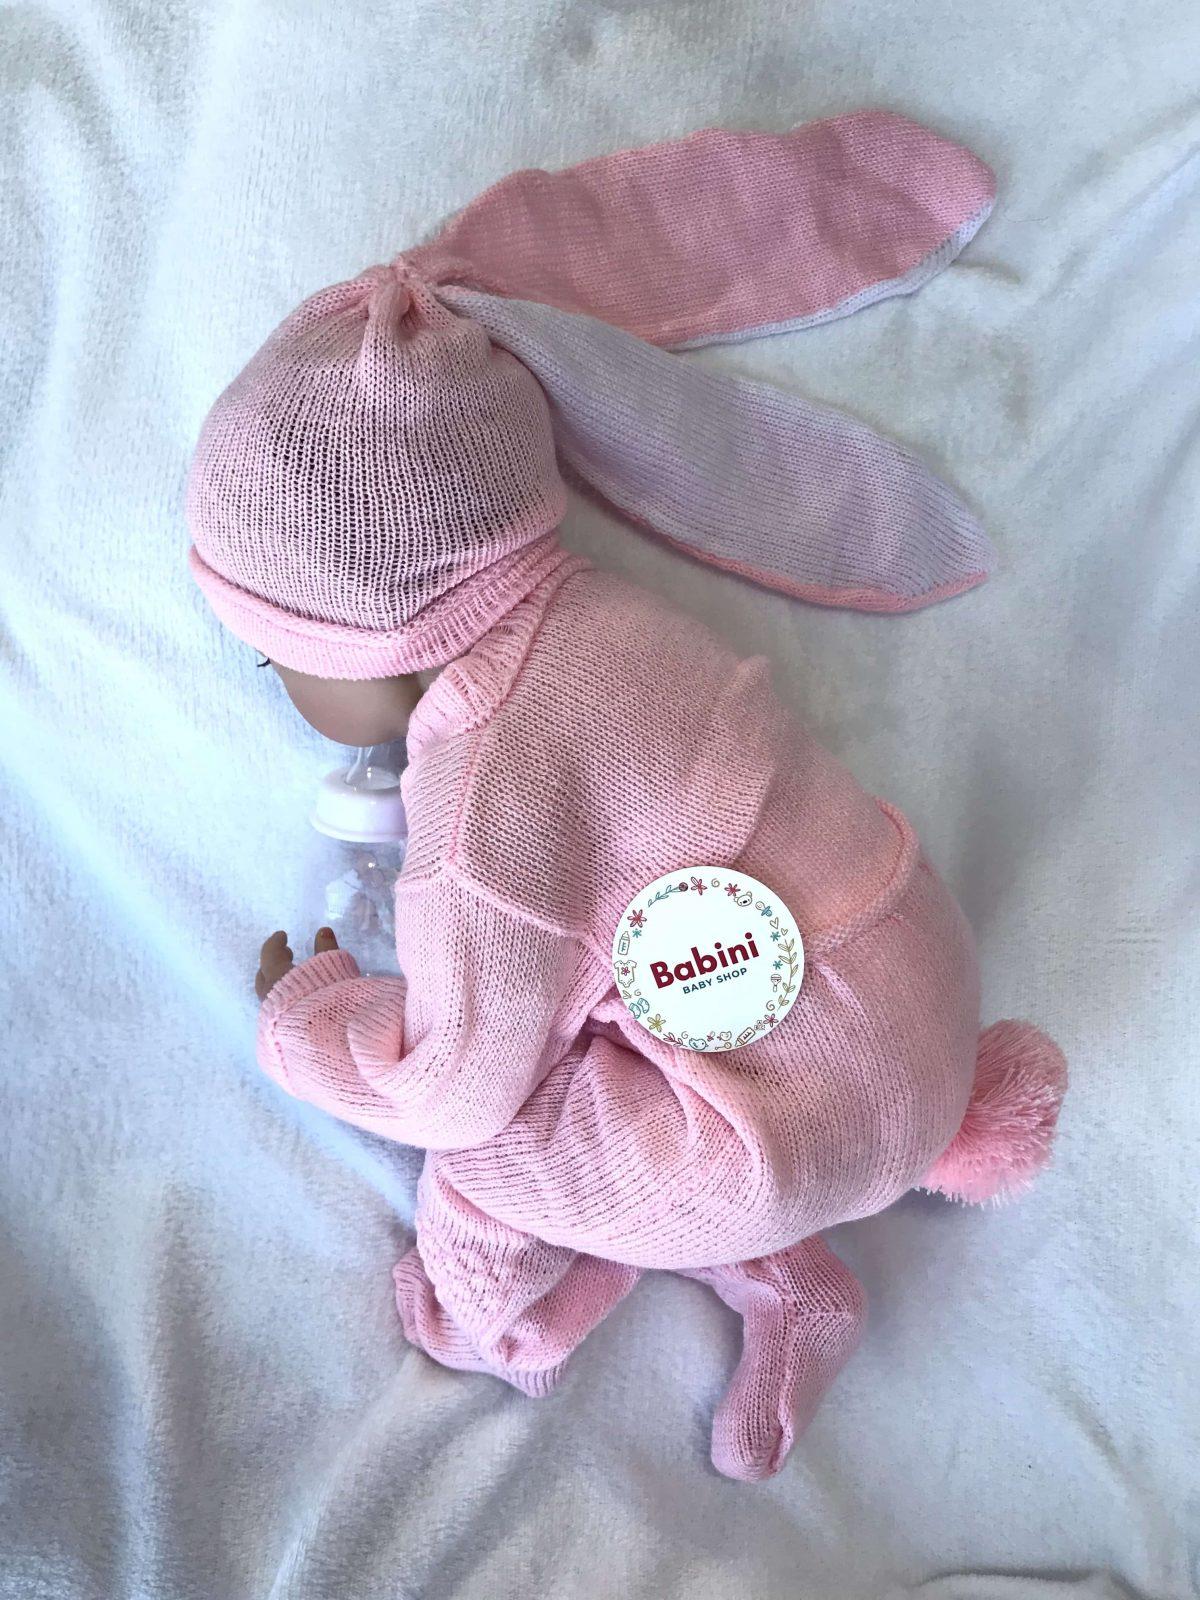 ajuar recien nacido bebé conejo